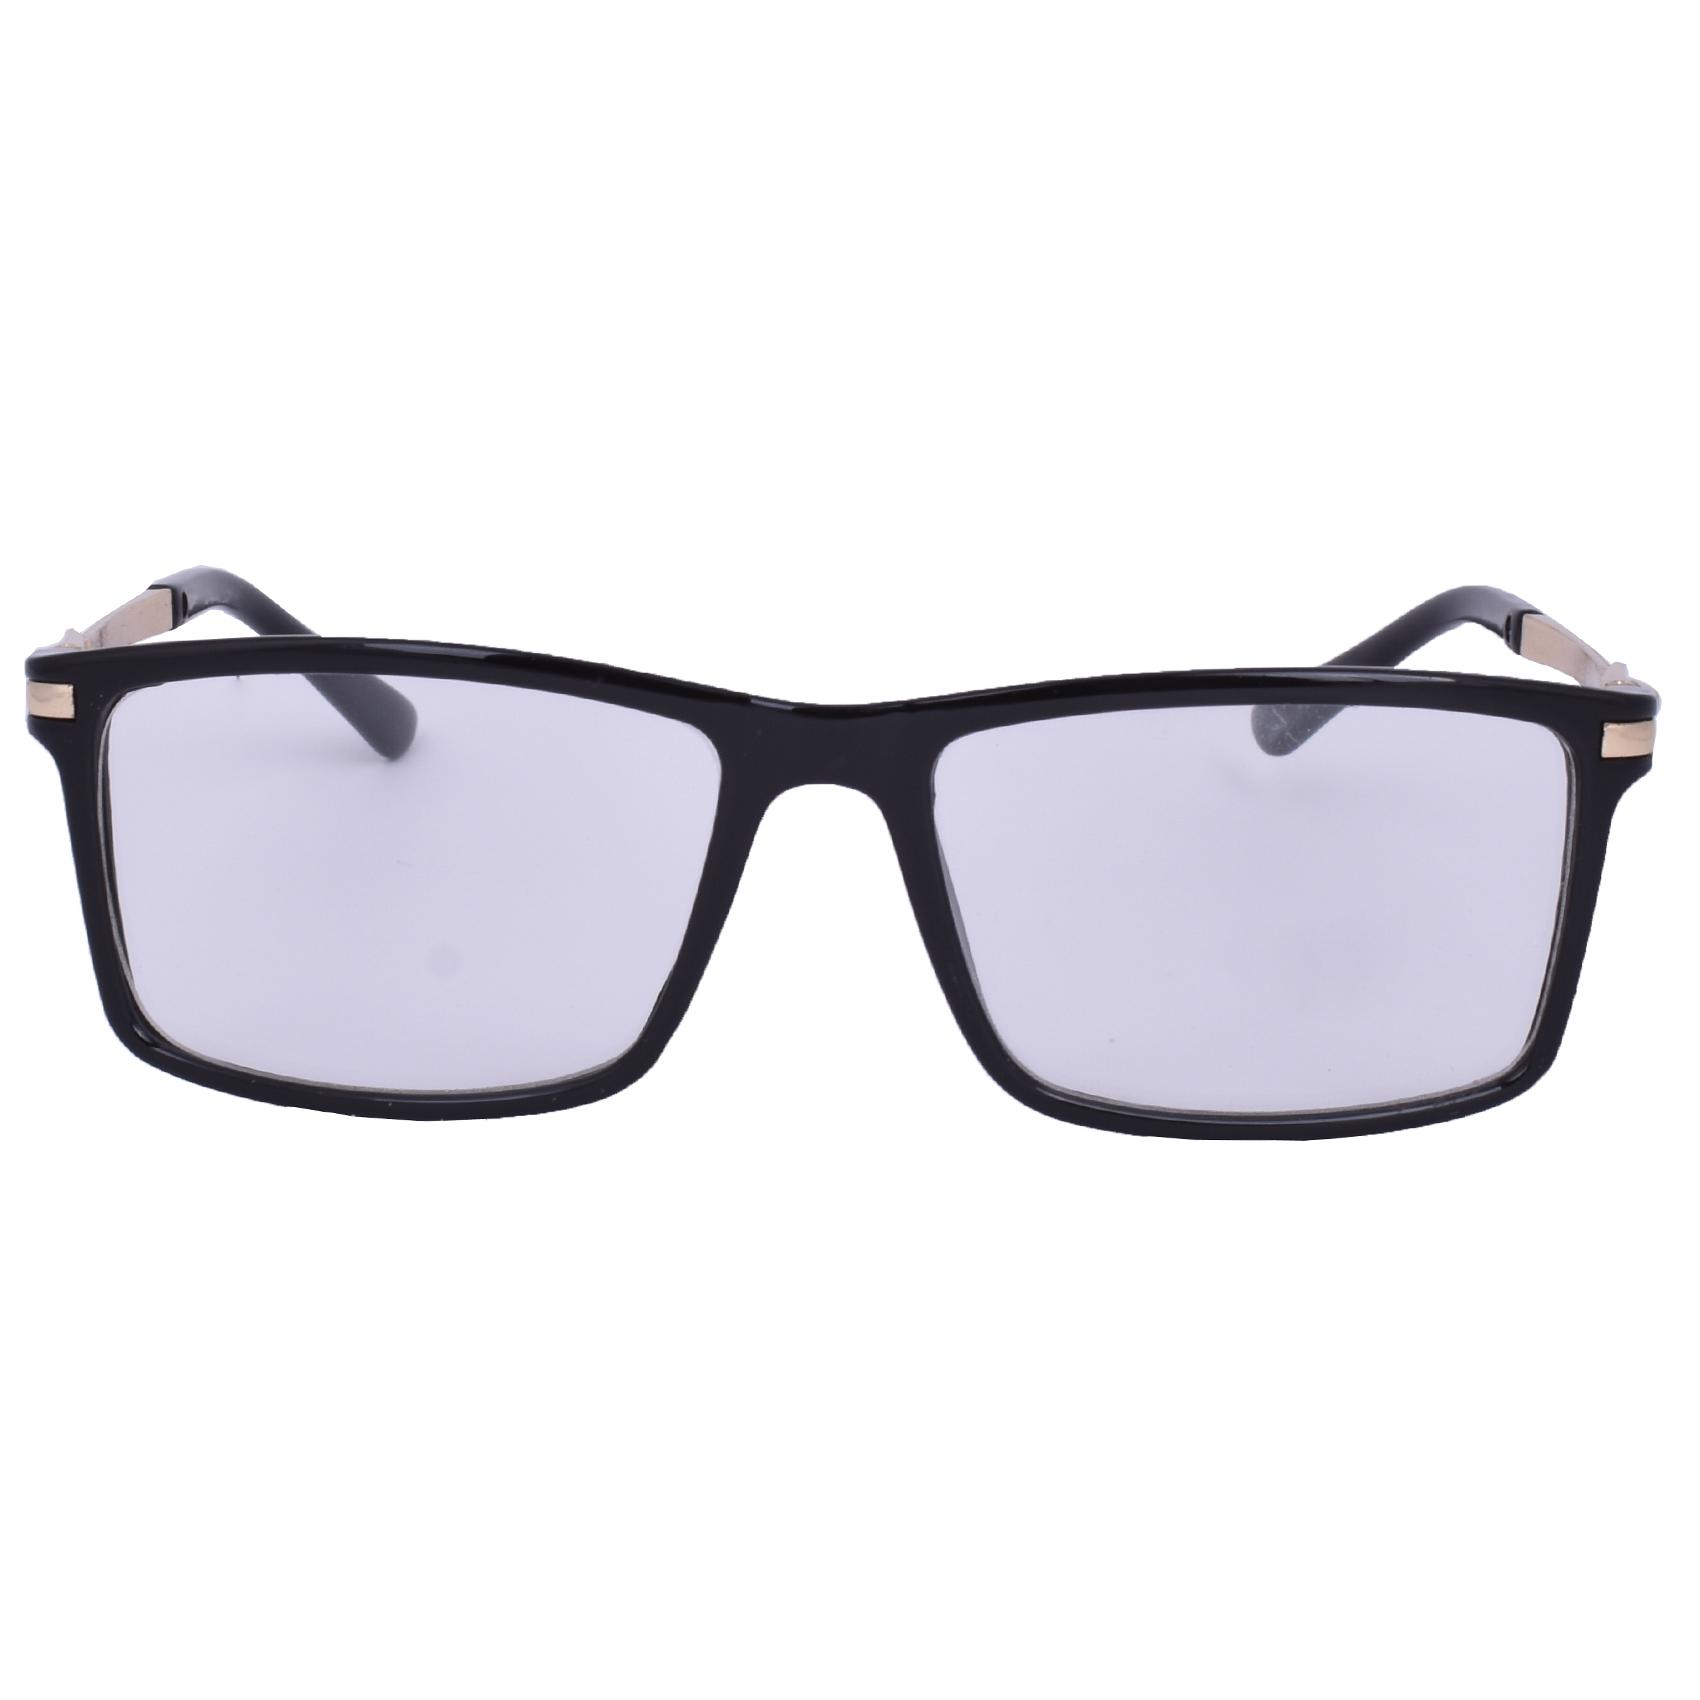 فریم عینک طبی کد 014